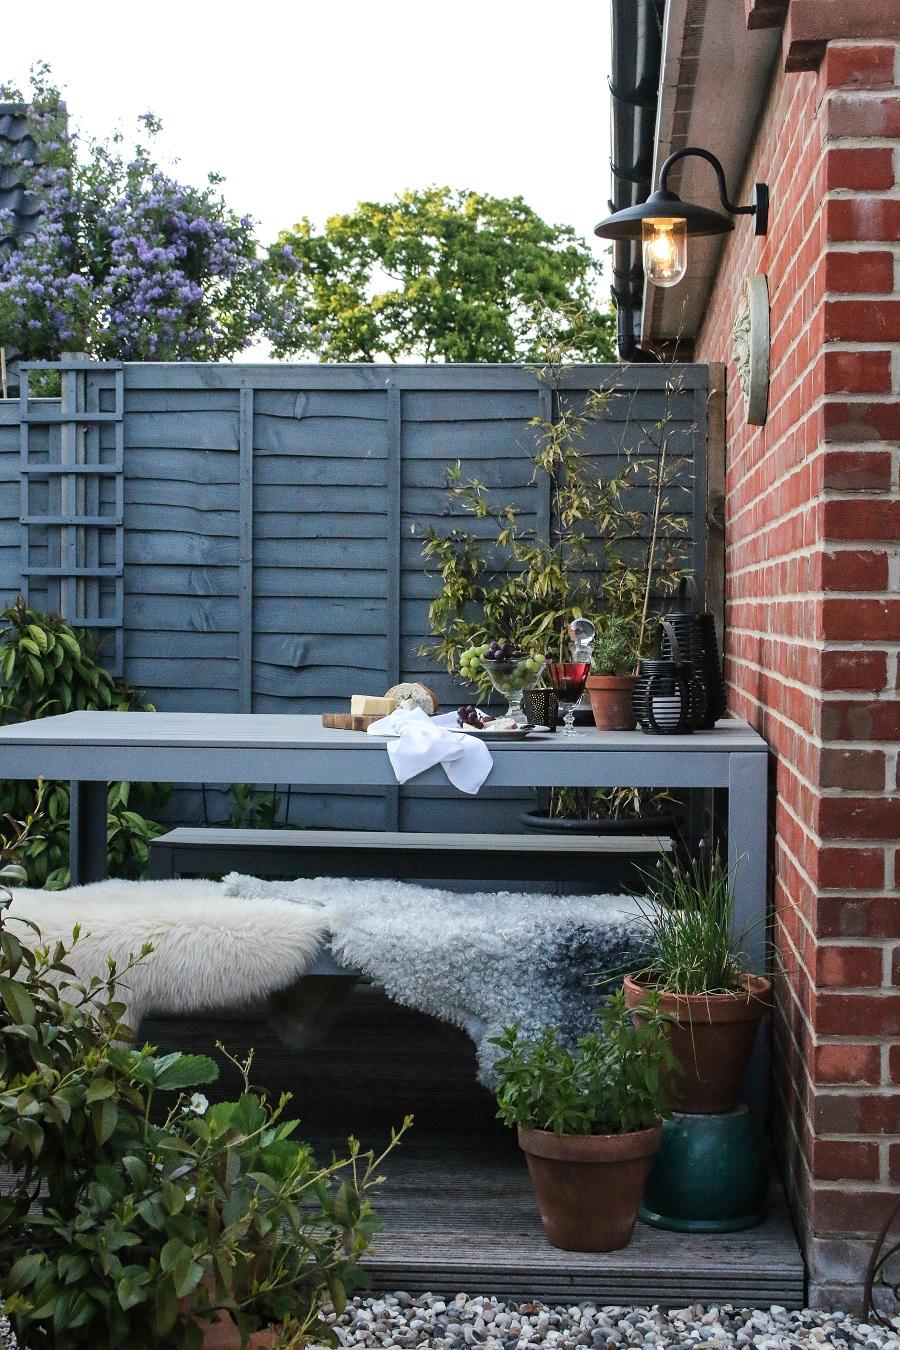 Garden Lights for Atmospheric Summer Nights